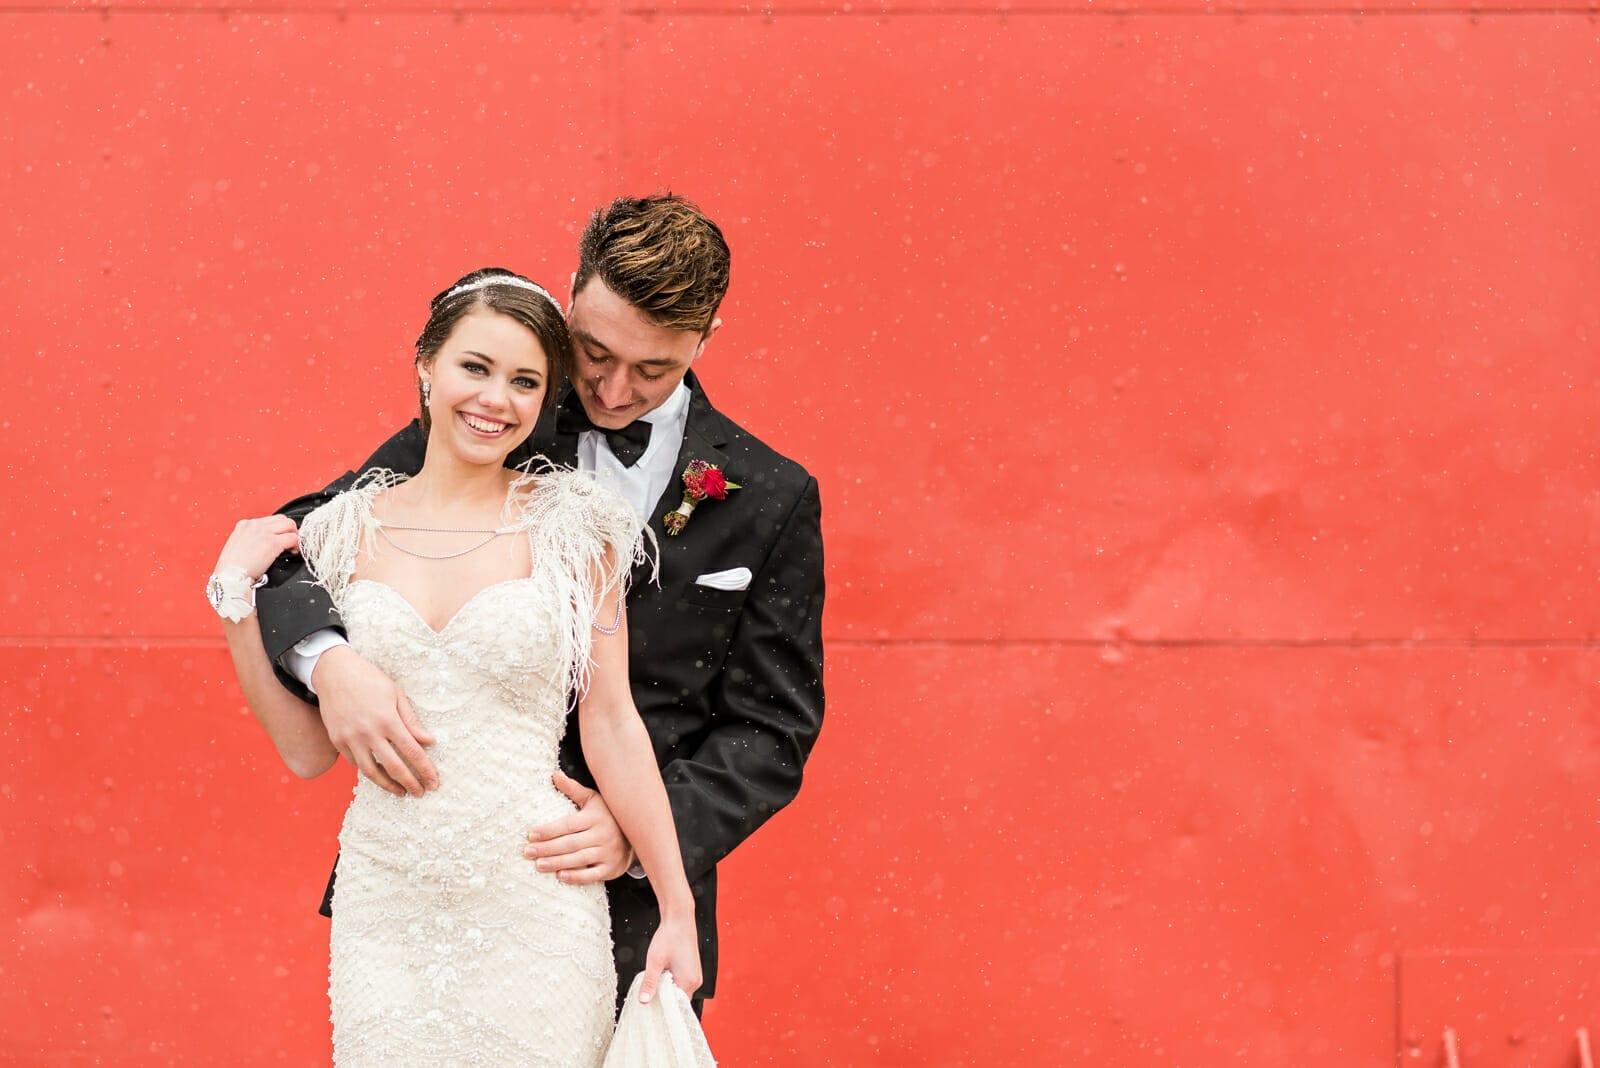 Colorful Winter Wedding Photo | Denver Colorado Wedding Photographer